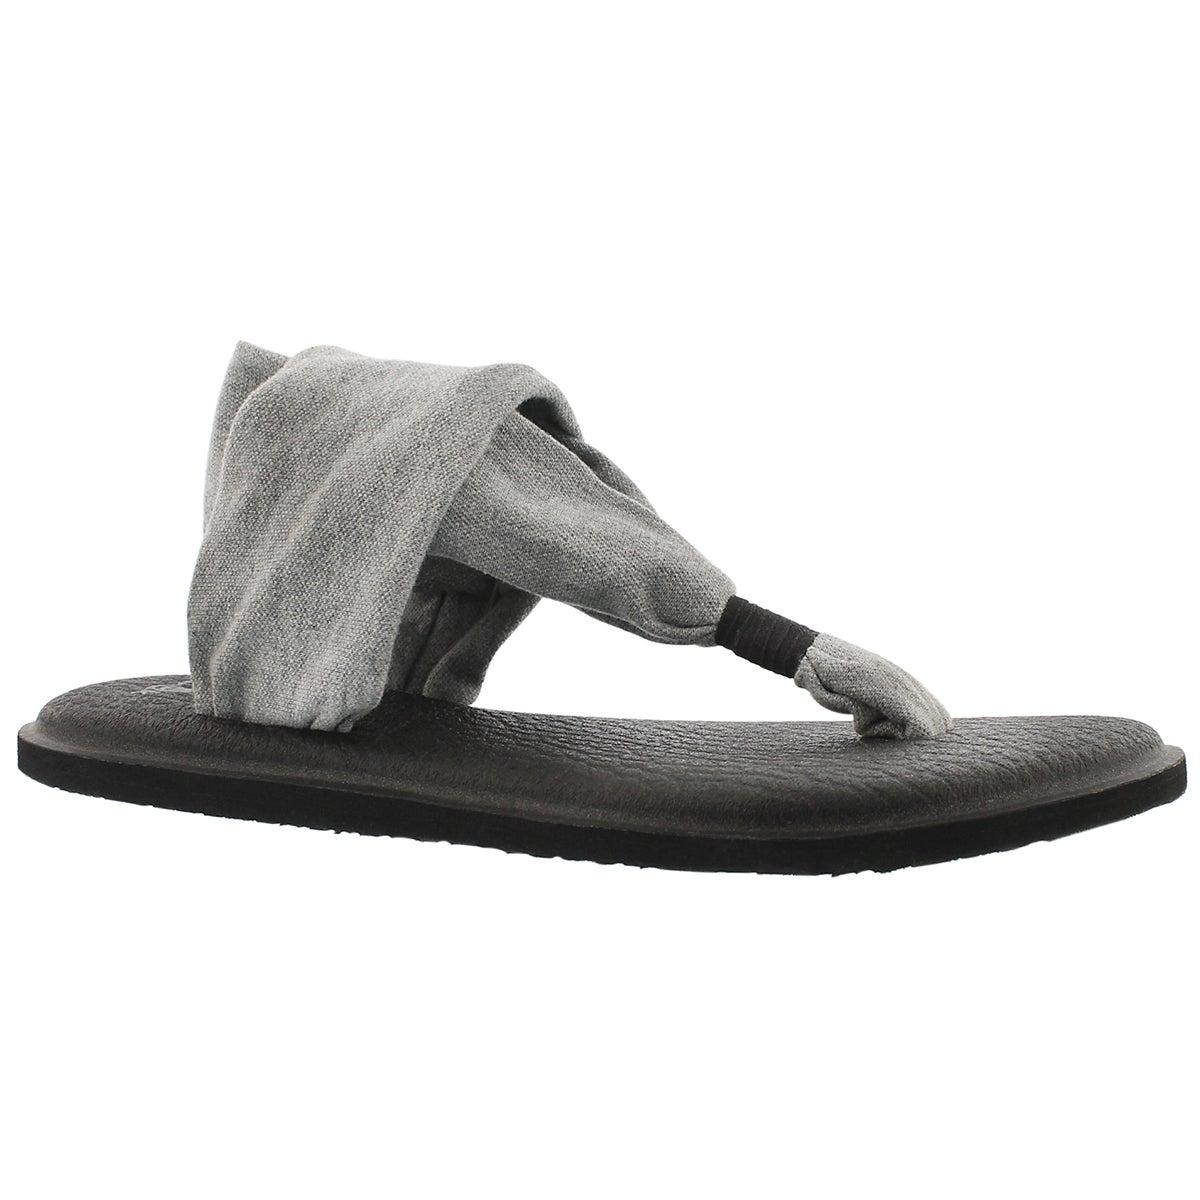 Women's YOGA SLING 2 grey thong sandals